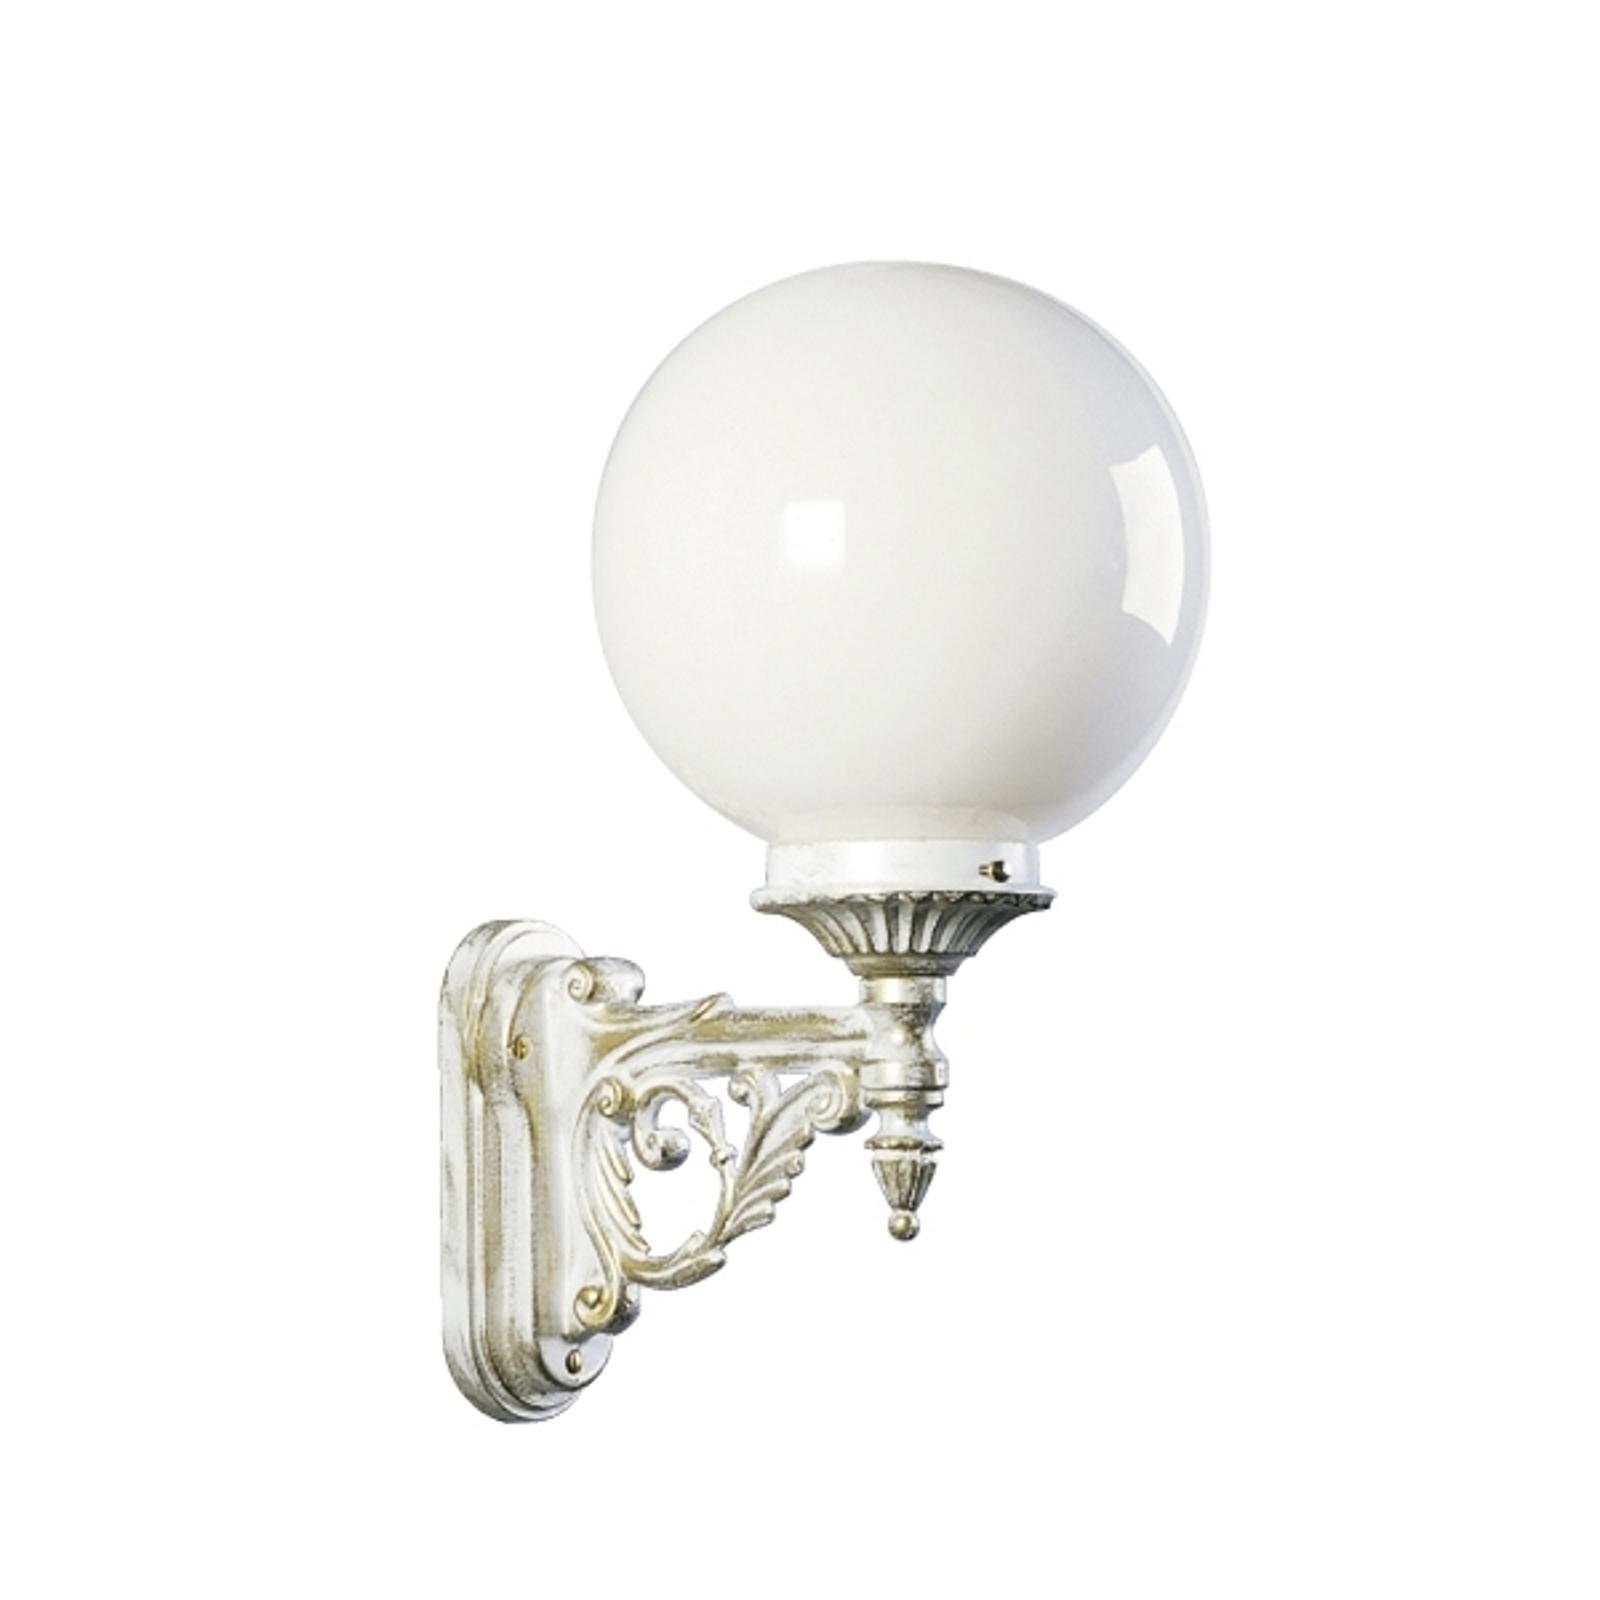 Decoratieve buitenwandlamp GOL 160